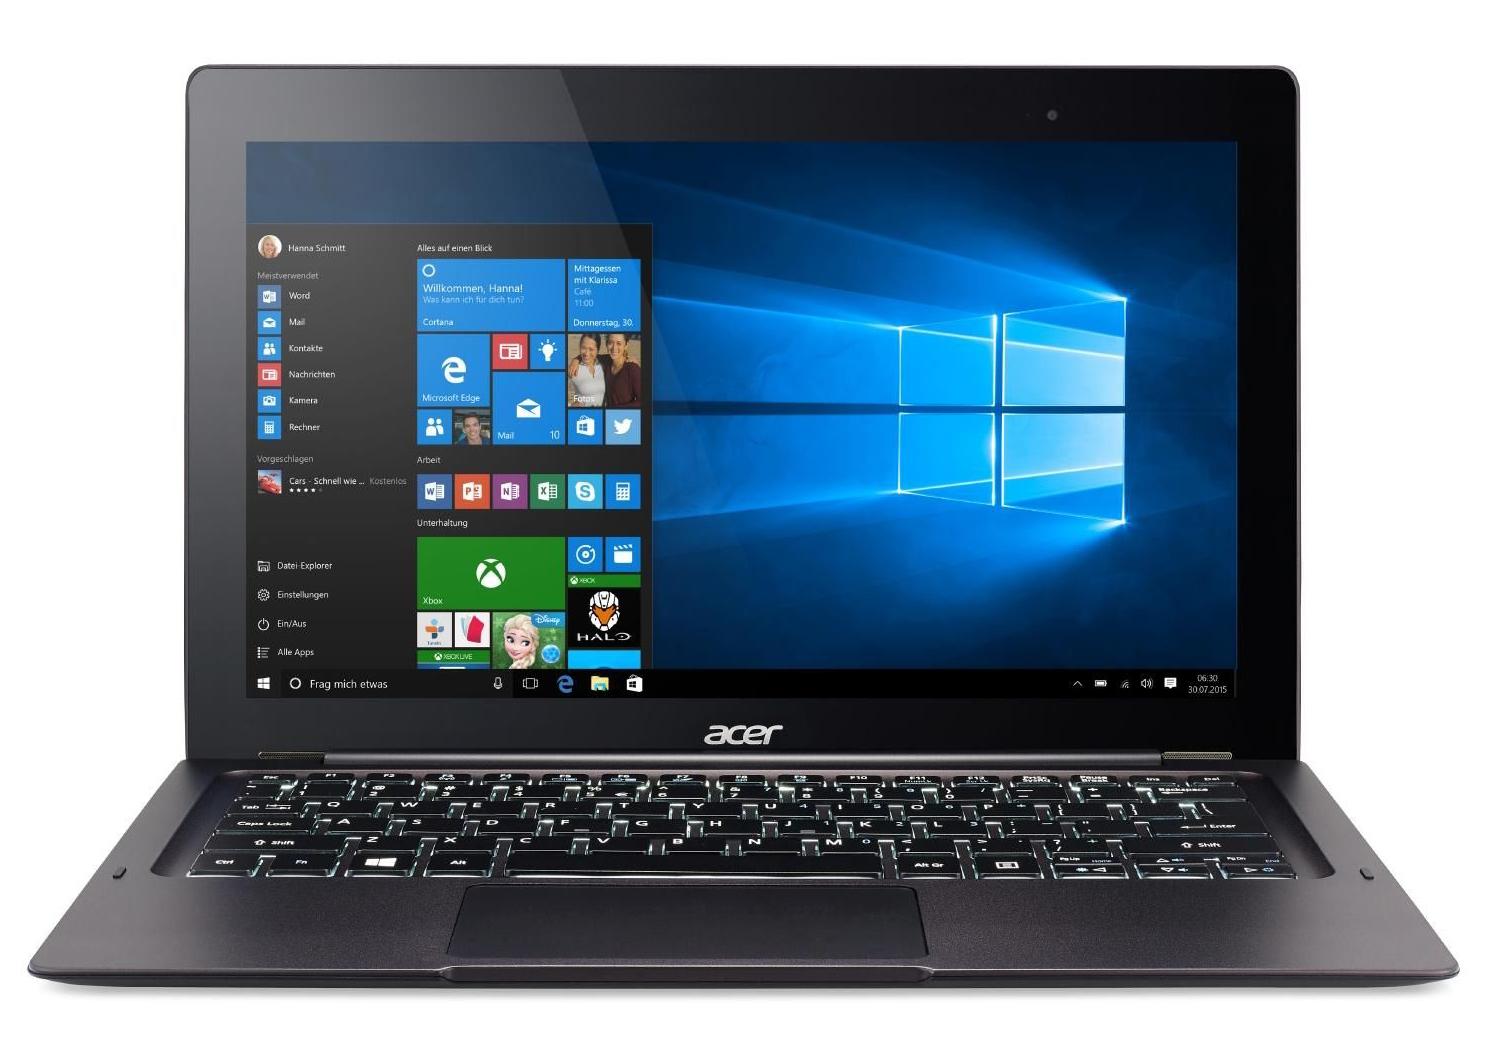 Acer SW7-272 Intel Graphics Windows 8 X64 Treiber